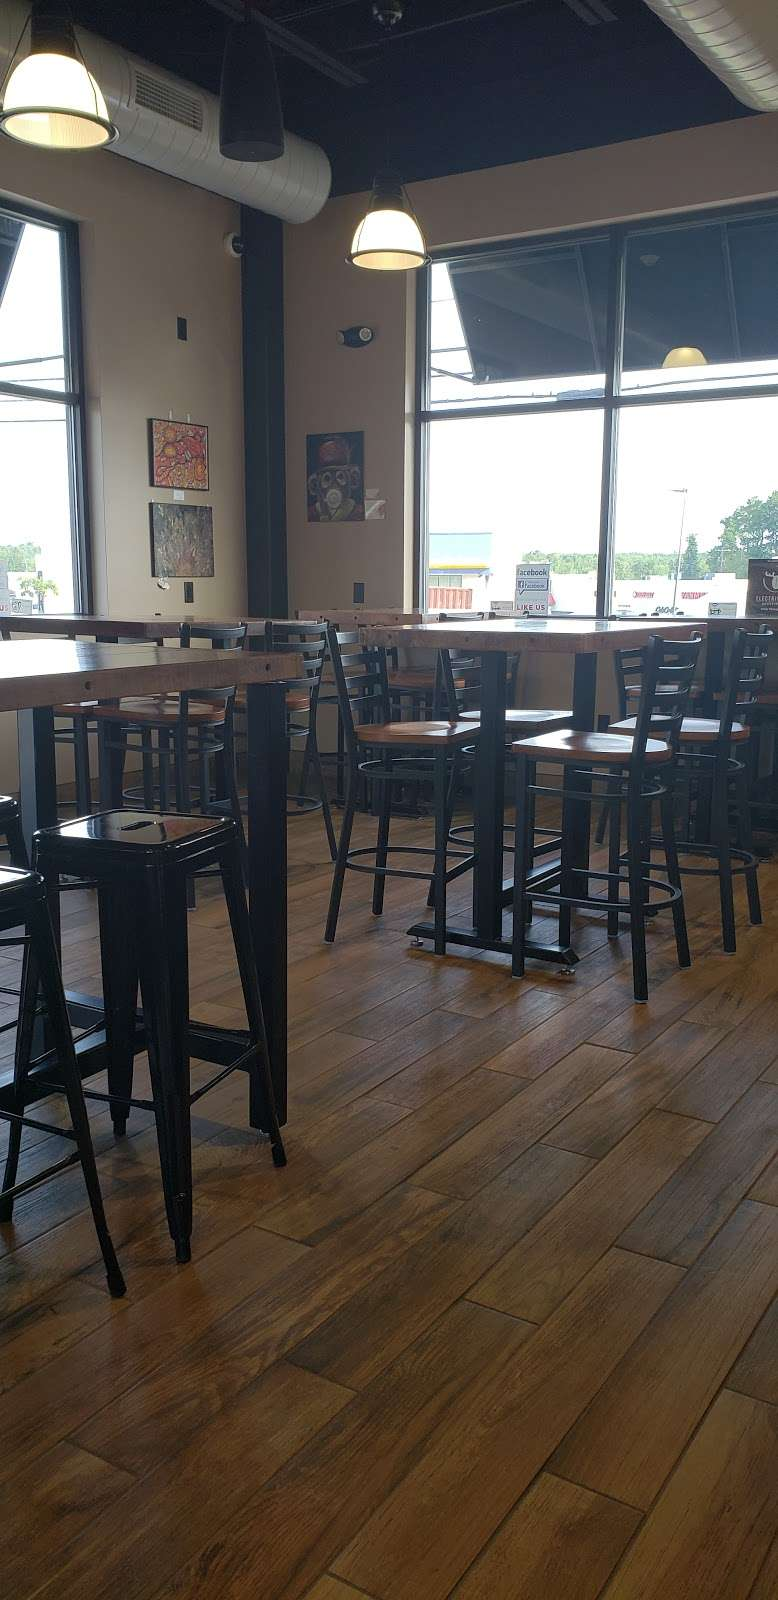 Kays Daily Grind - cafe  | Photo 5 of 10 | Address: 480 Daleville Hwy, Covington Township, PA 18444, USA | Phone: (570) 843-6271